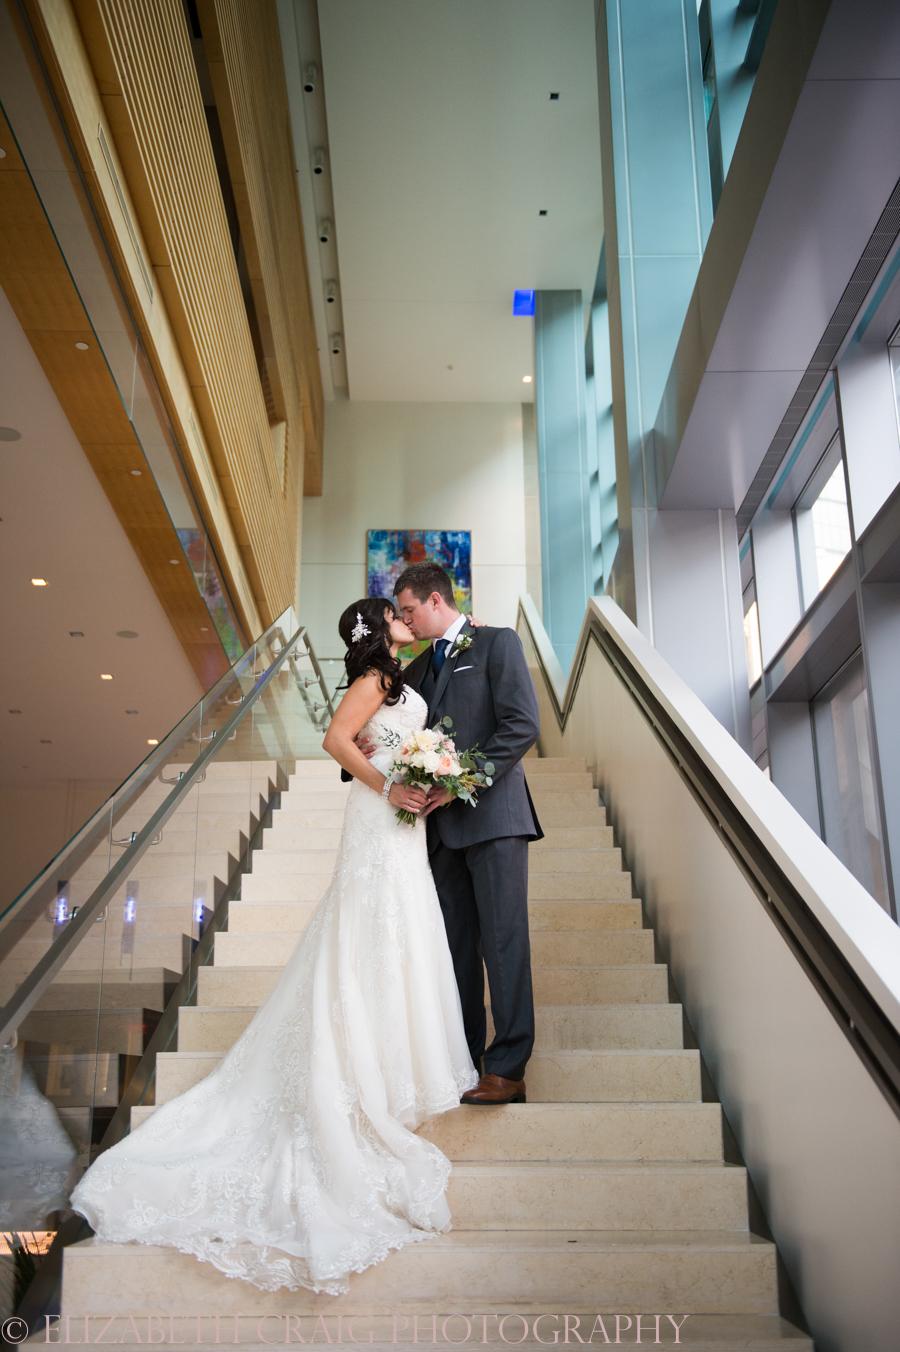 pittsburgh-greek-weddings-fairmont-weddings-receptions-elizabeth-craig-photohgraphy-017